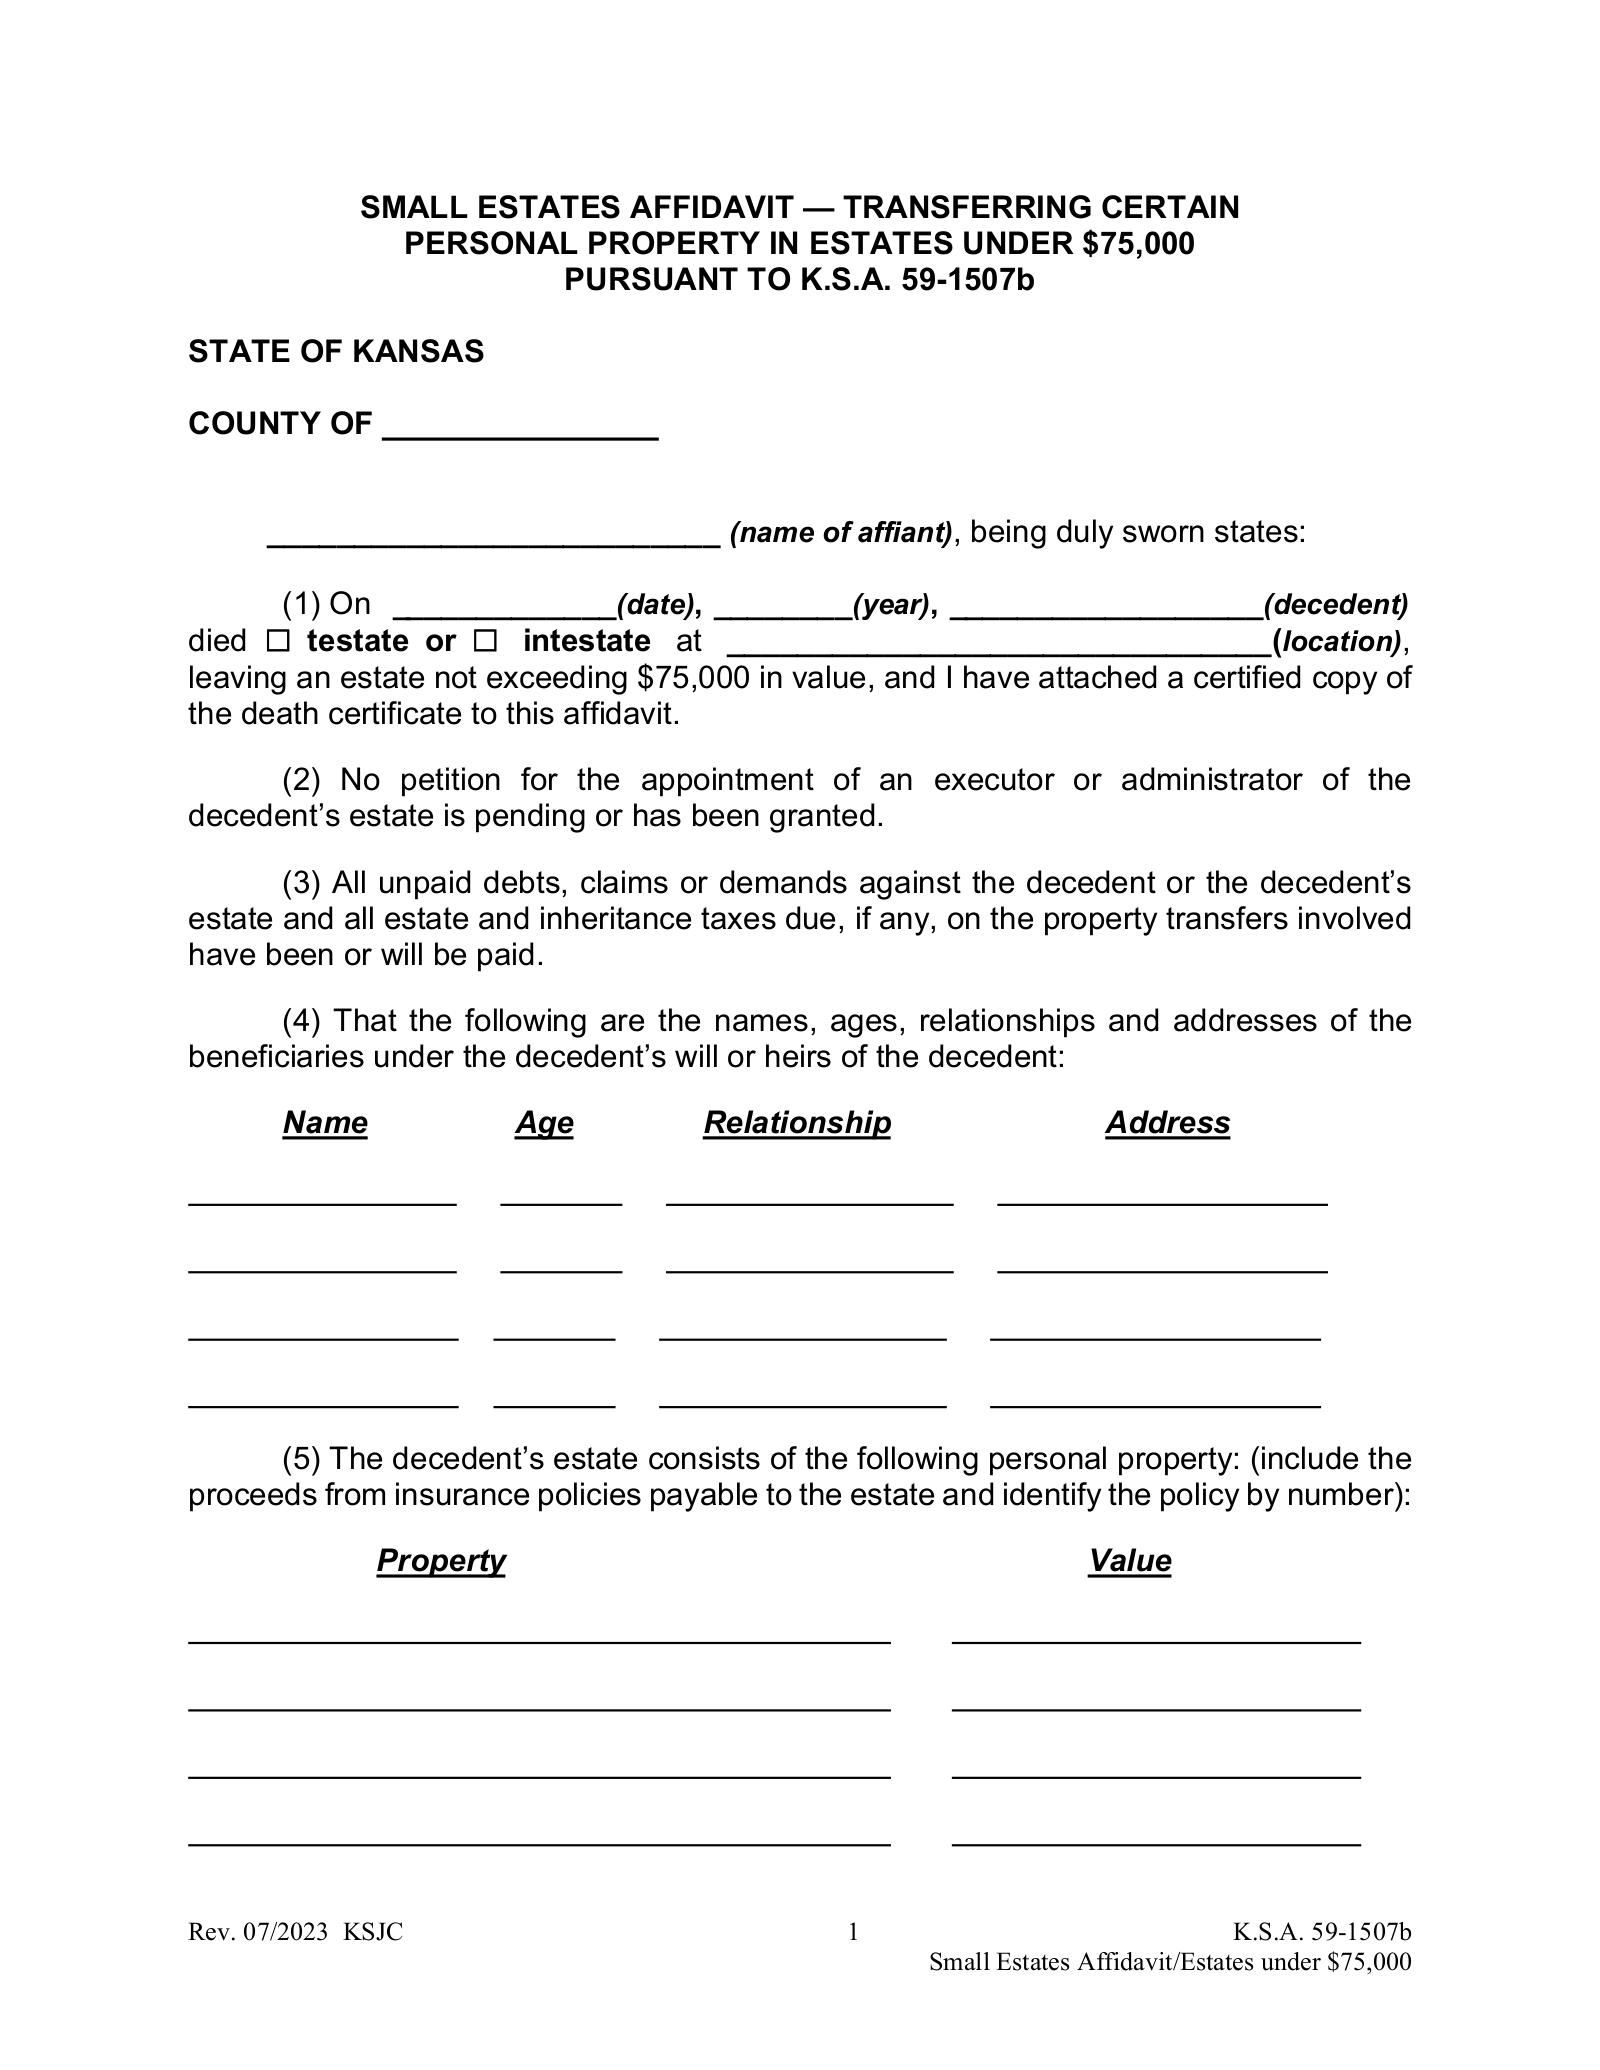 Free Kansas Small Estate Affidavit Form